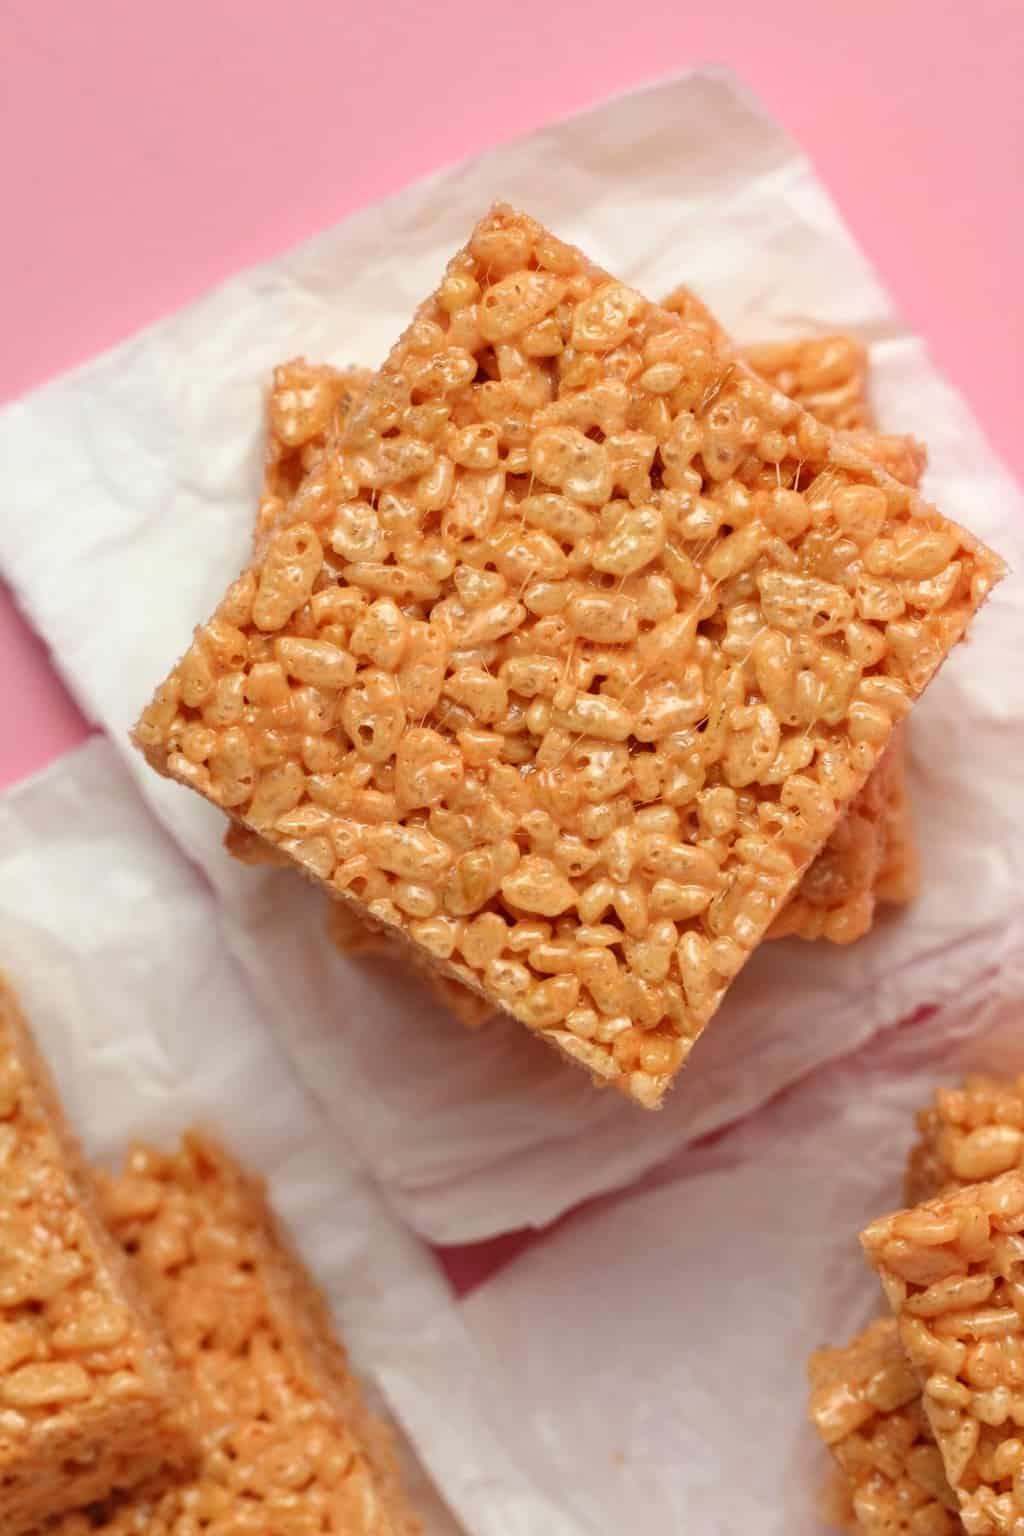 Vegan rice krispie treats in a stack on white tissue paper.